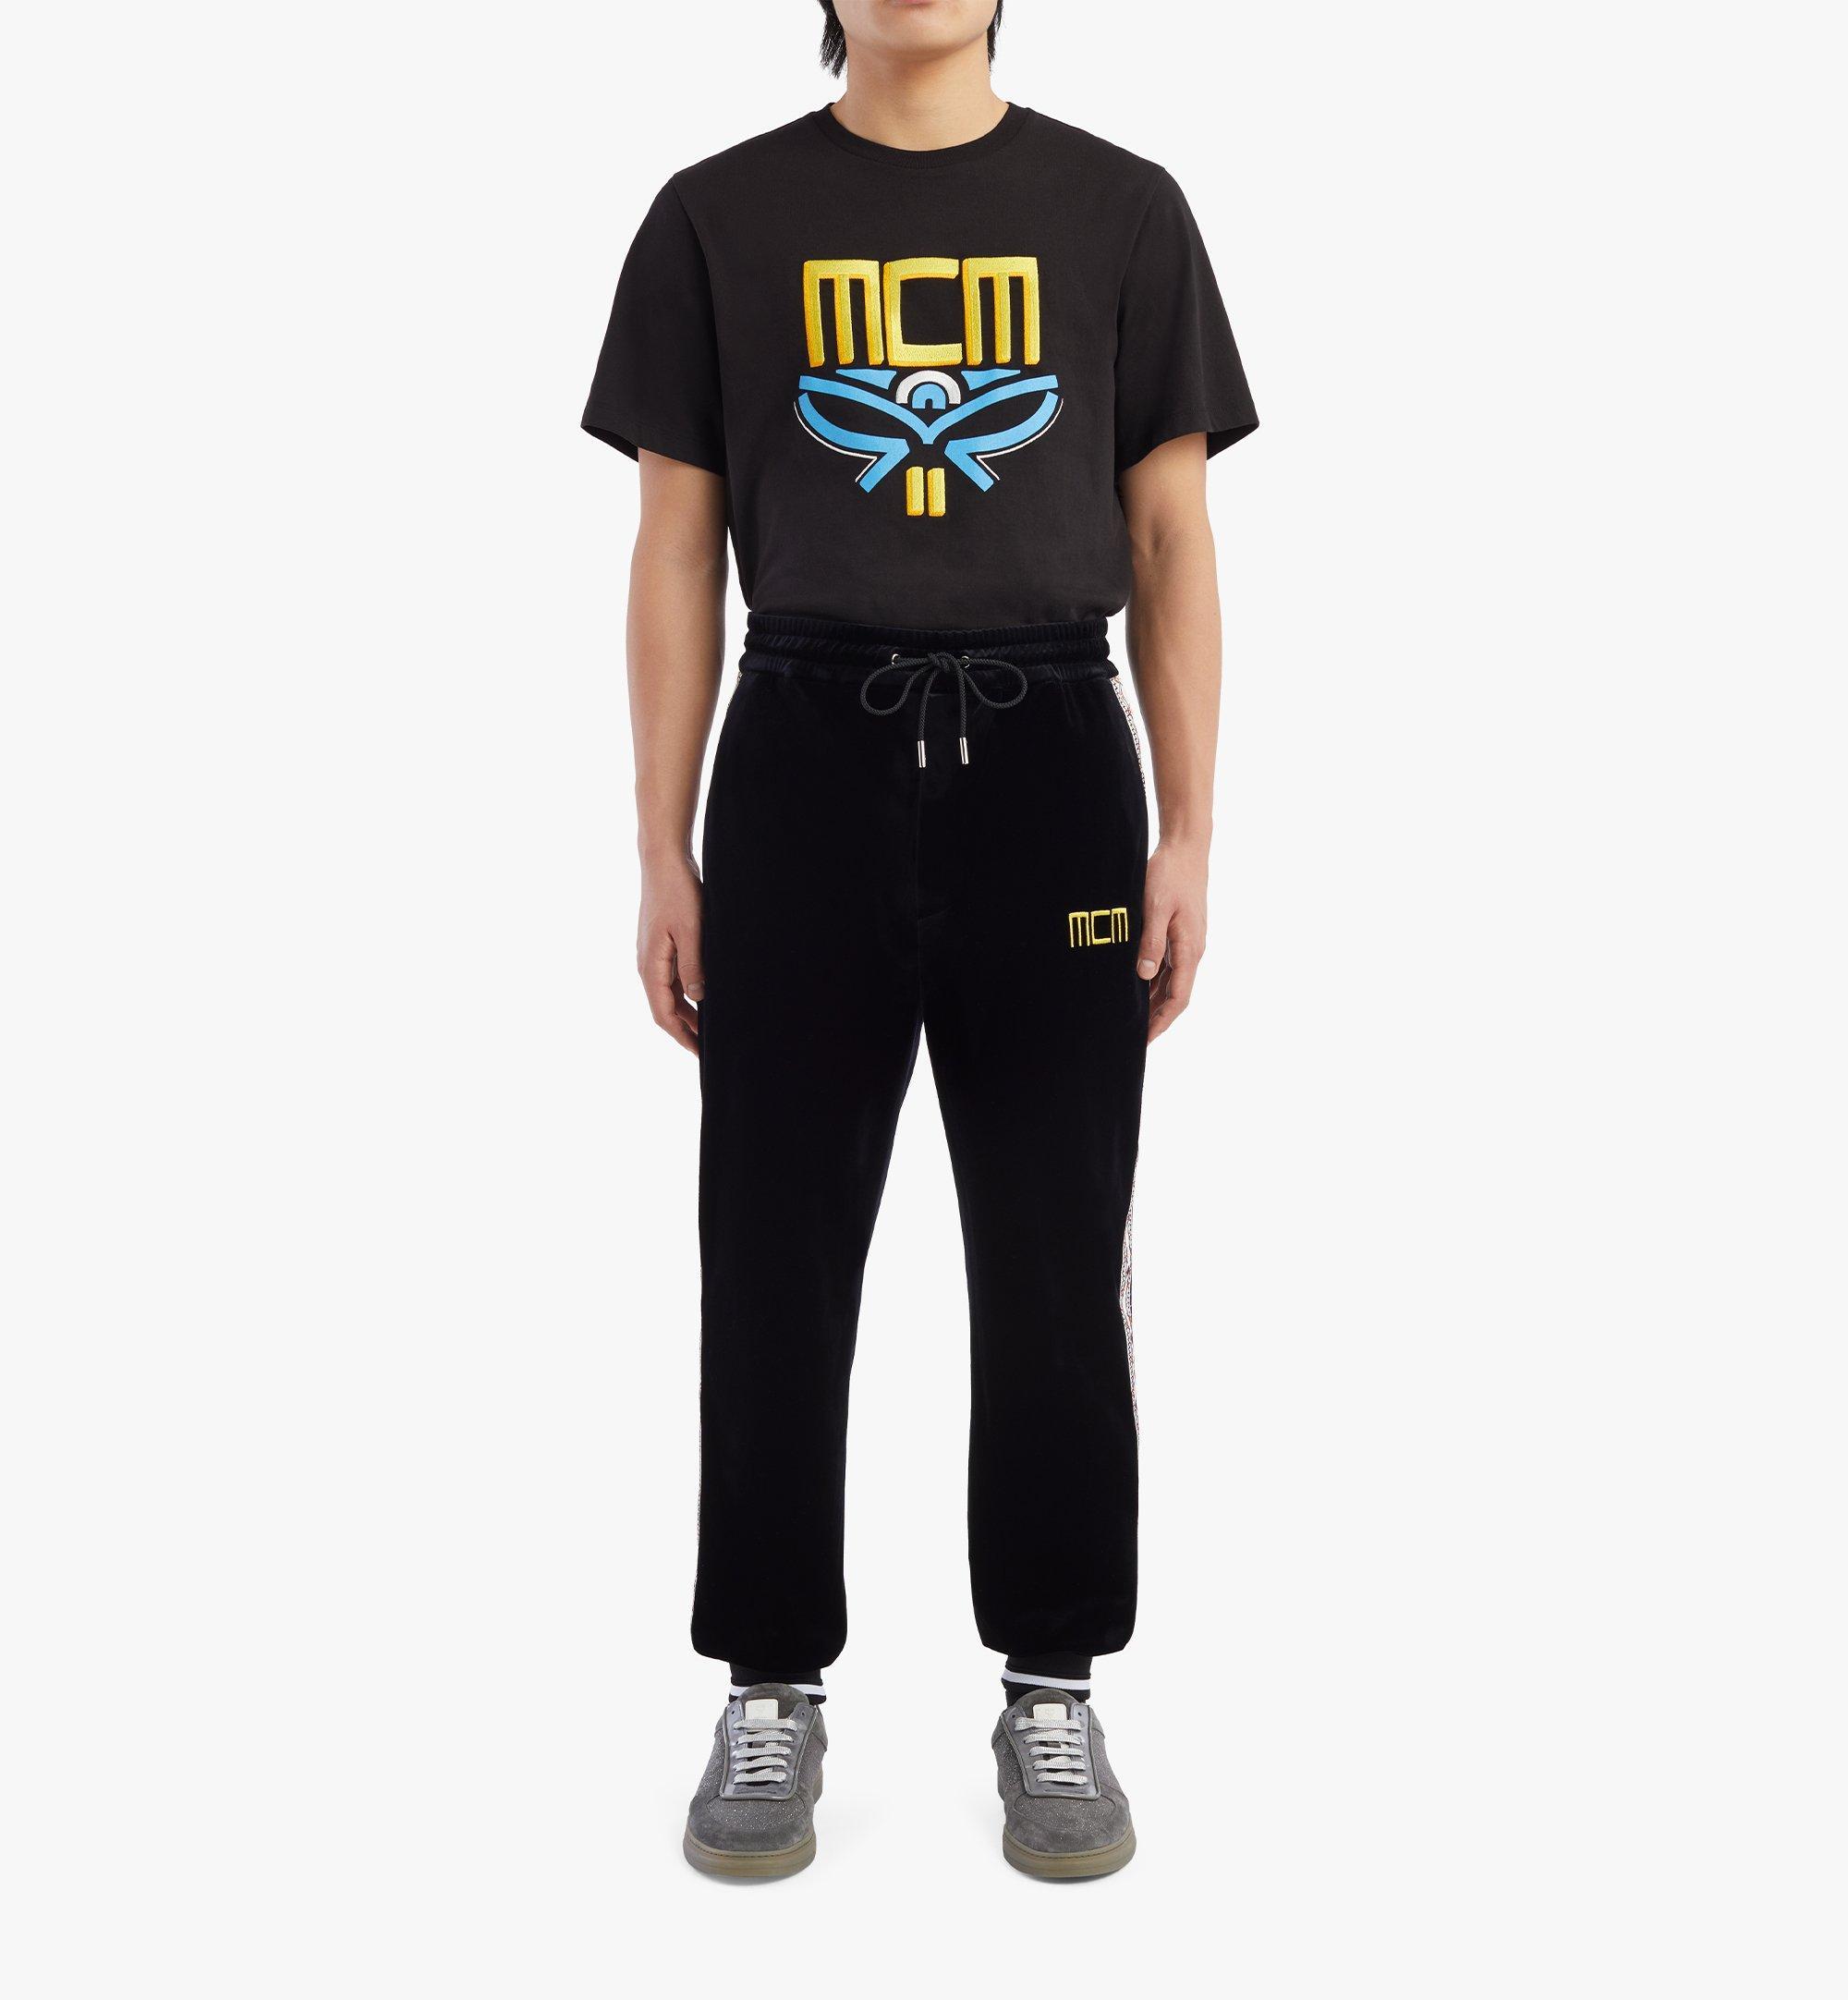 MCM Geo月桂叶丝绒运动裤 Black MHPBSMM04BK00M 更多视角 3